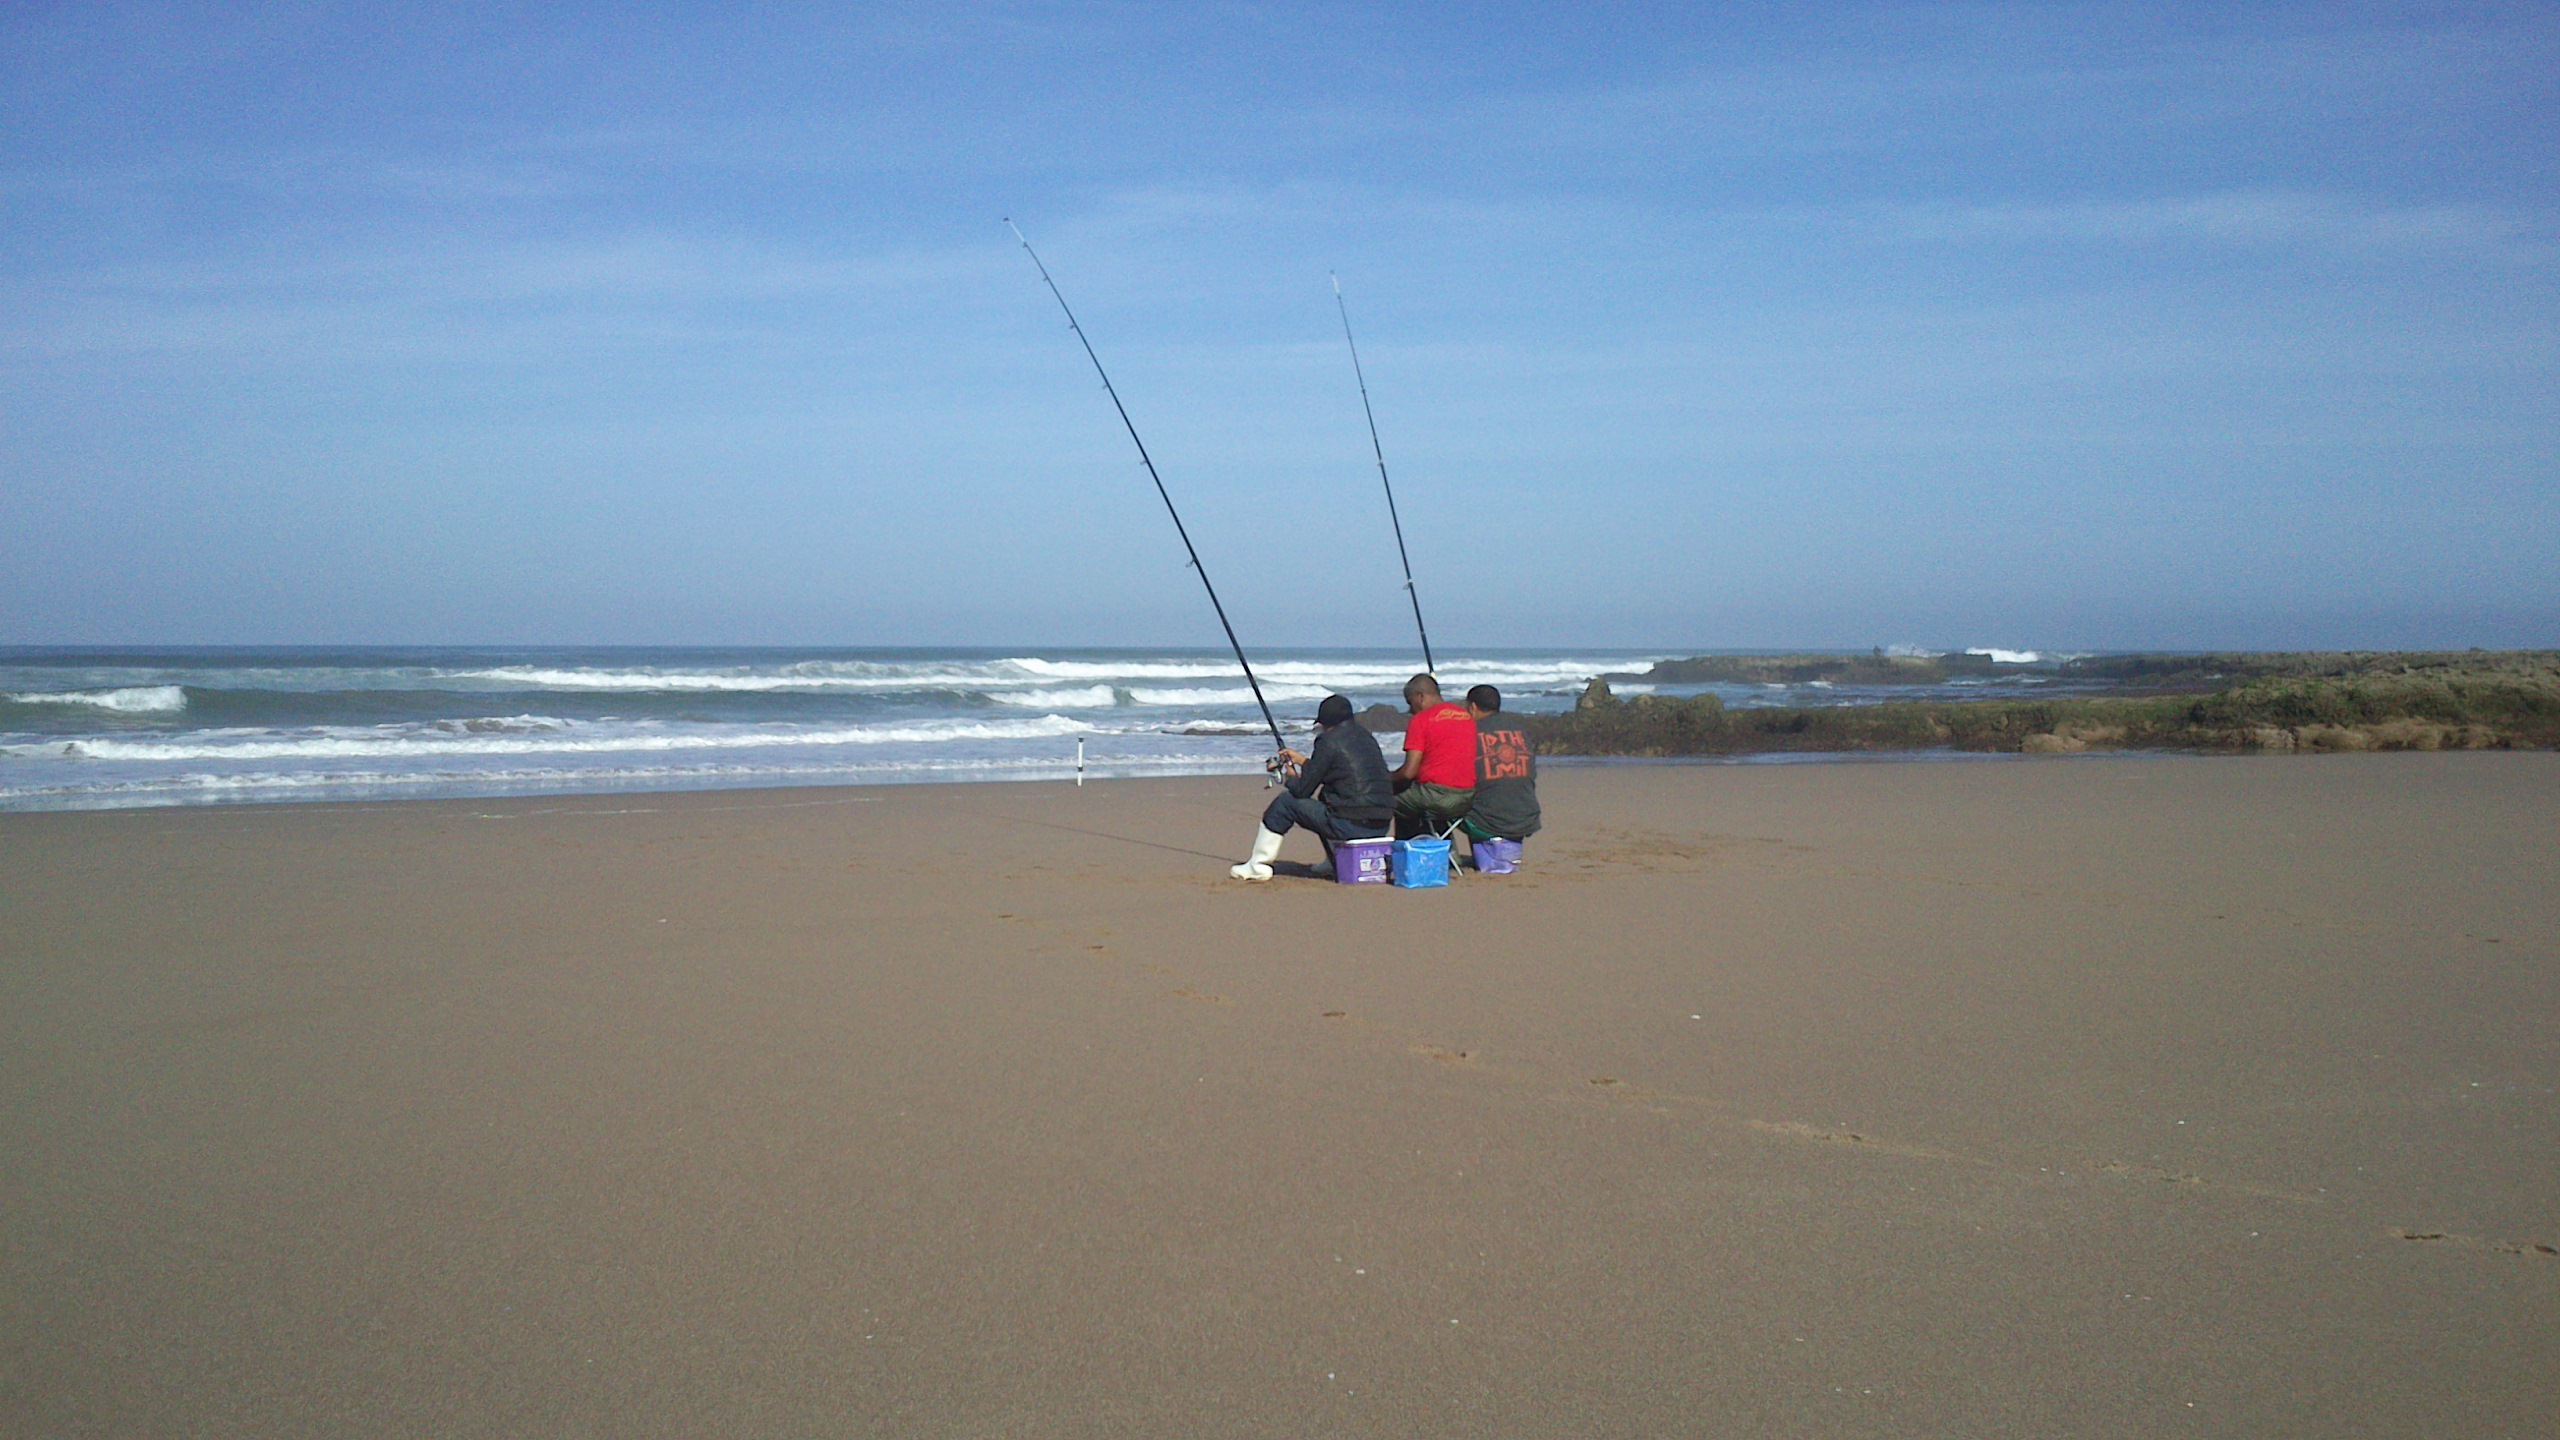 La pêche, c'est la nature